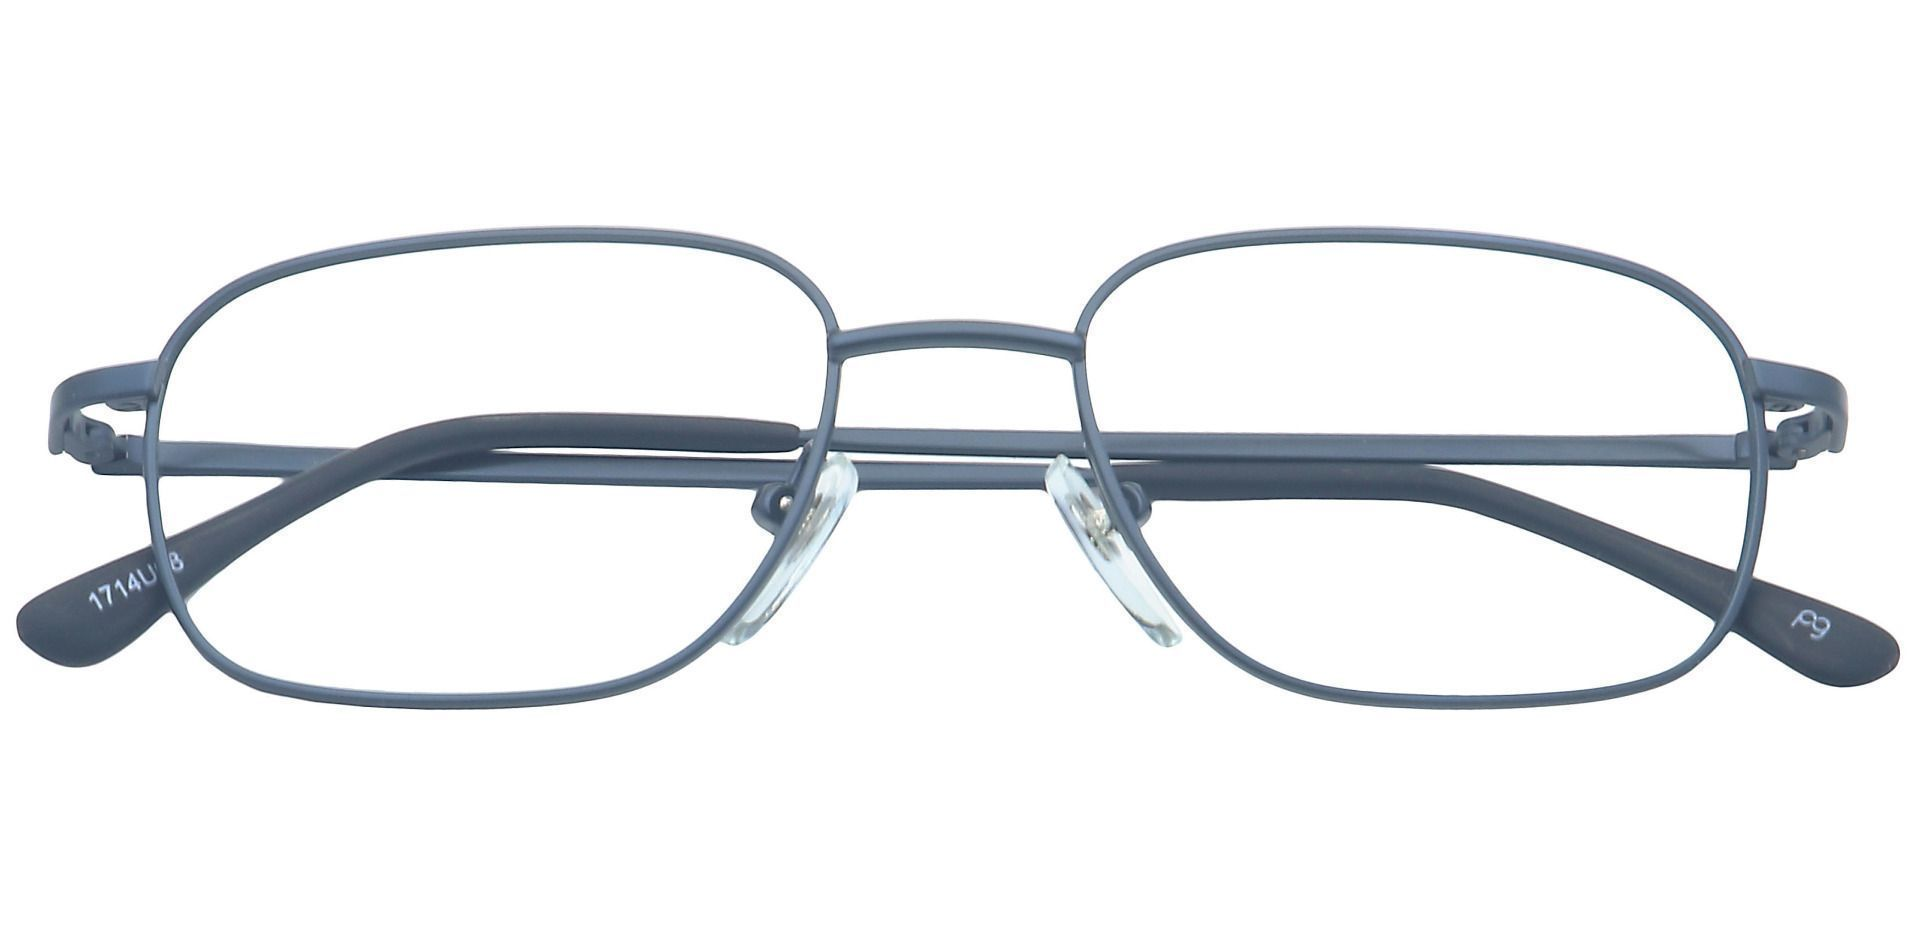 Scott Rectangle Non-Rx Glasses - Blue